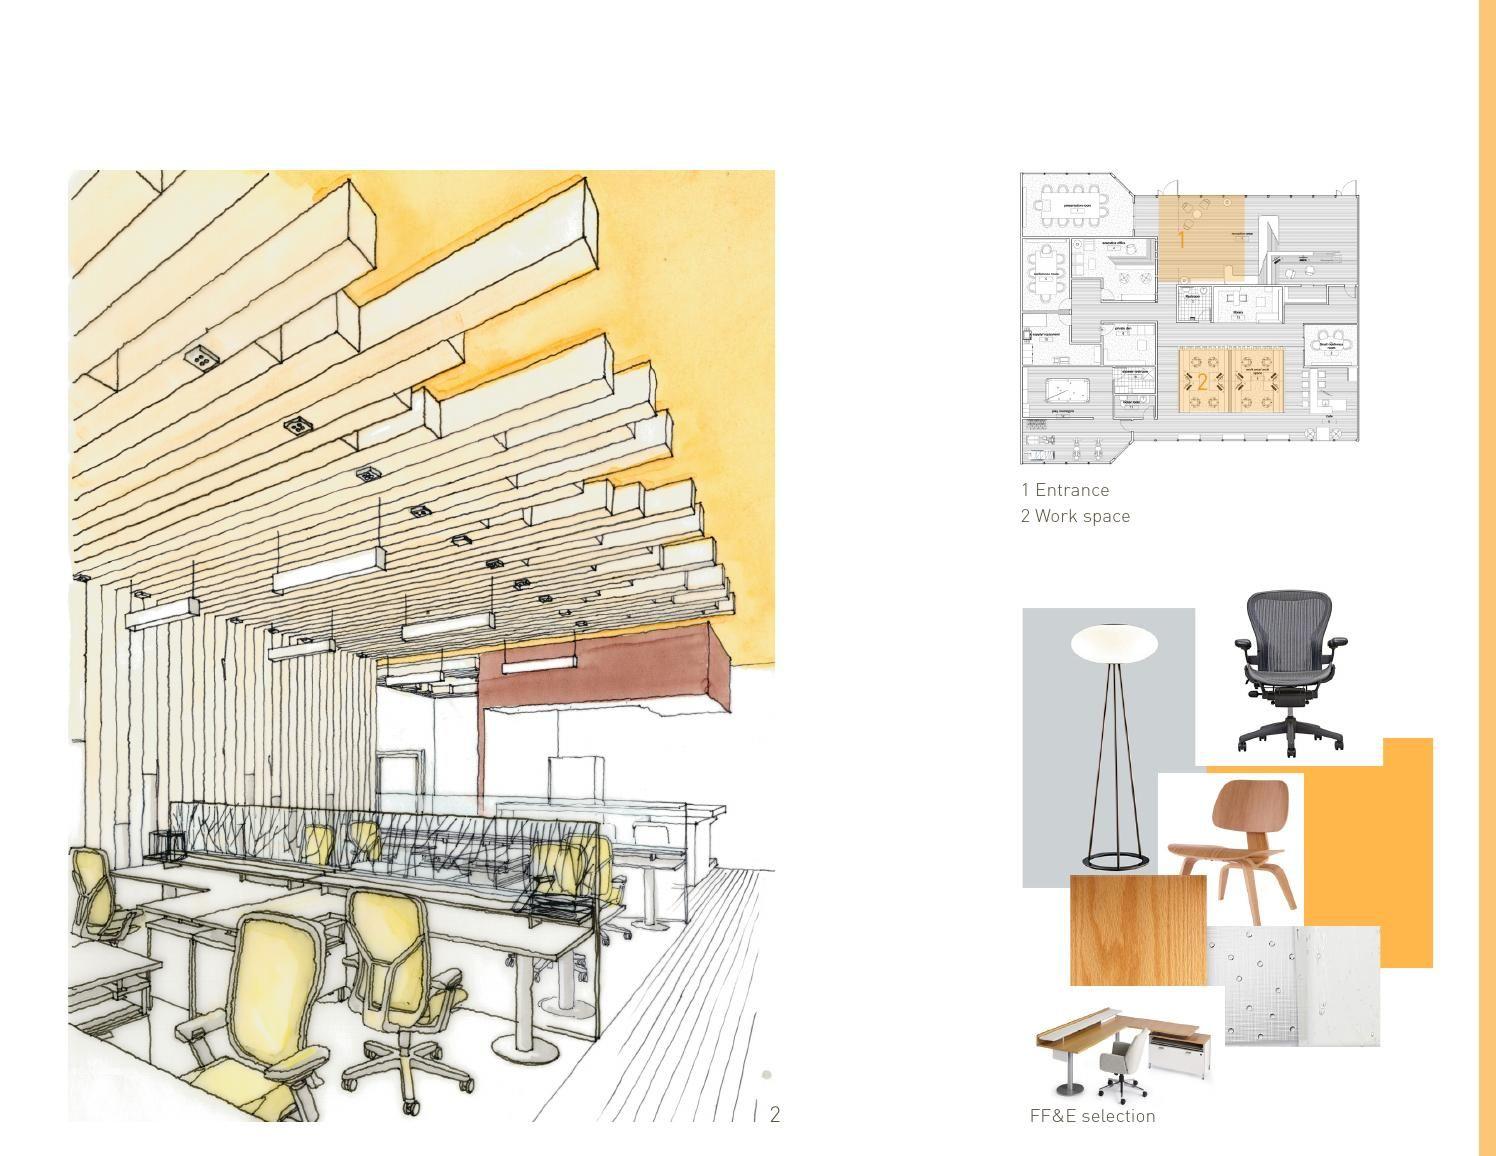 New Interior design portfolio 2013 | Portfolios ...